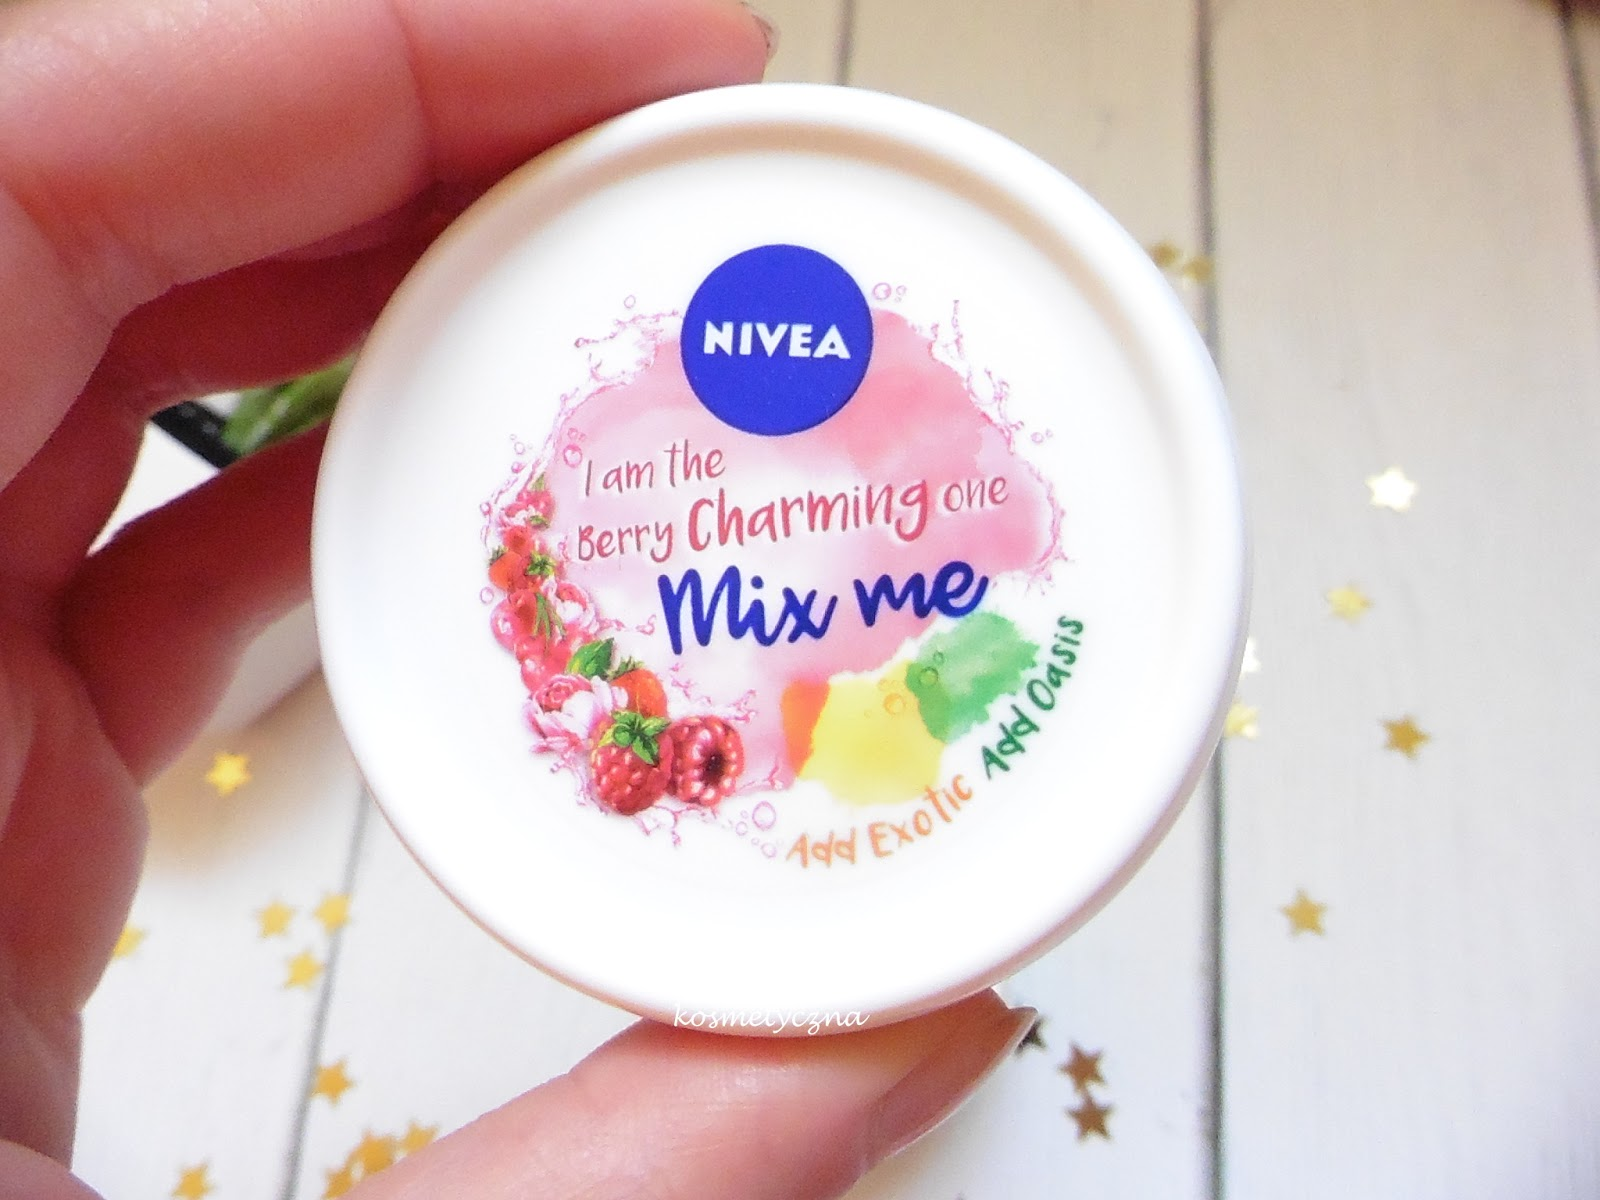 kolorowe-kremy-nivea, nivea-soft-mix-me, nivea-letnie-kremy, nivea-krem-nawilzajacy